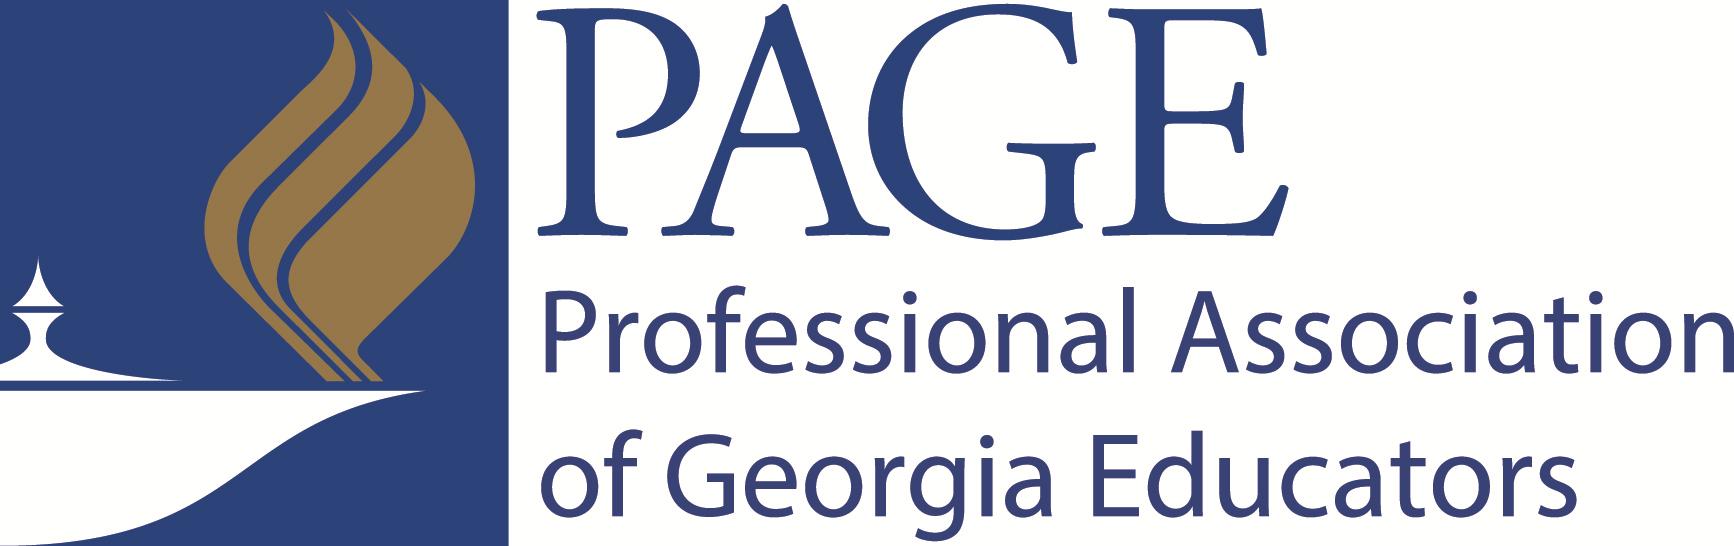 Professional Association of GA Educators (PAGE) Company Logo